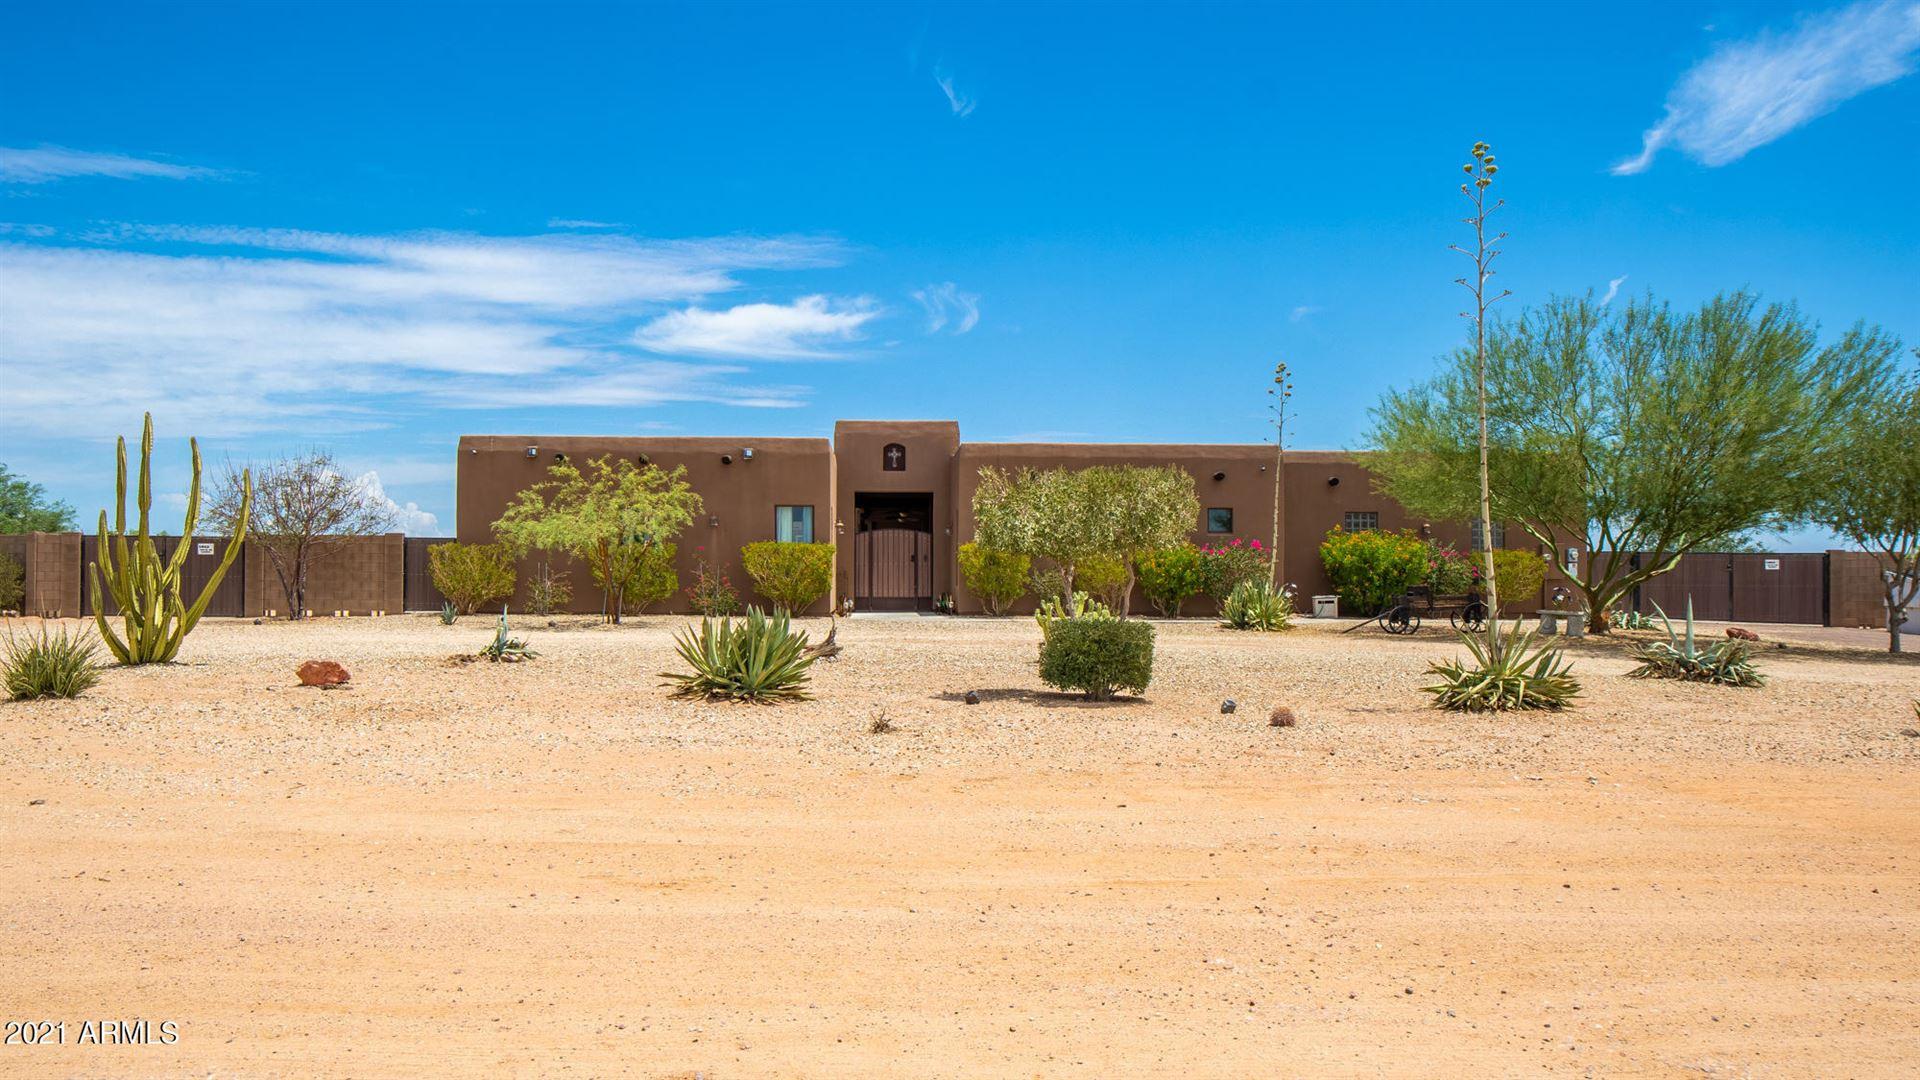 Photo of 29107 N 259TH Avenue, Wittmann, AZ 85361 (MLS # 6262930)